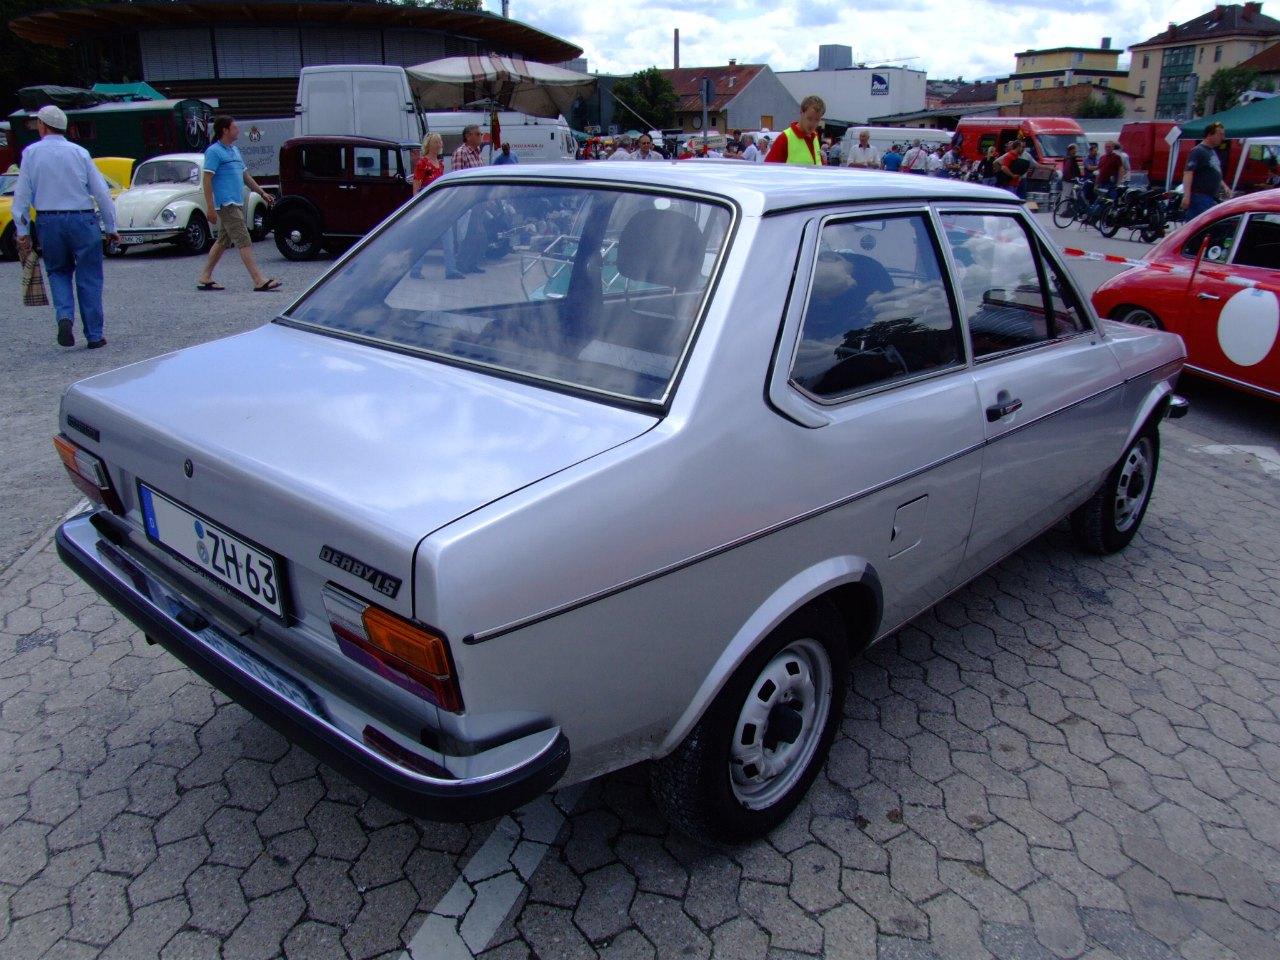 VW_Derby_LS_2.JPG